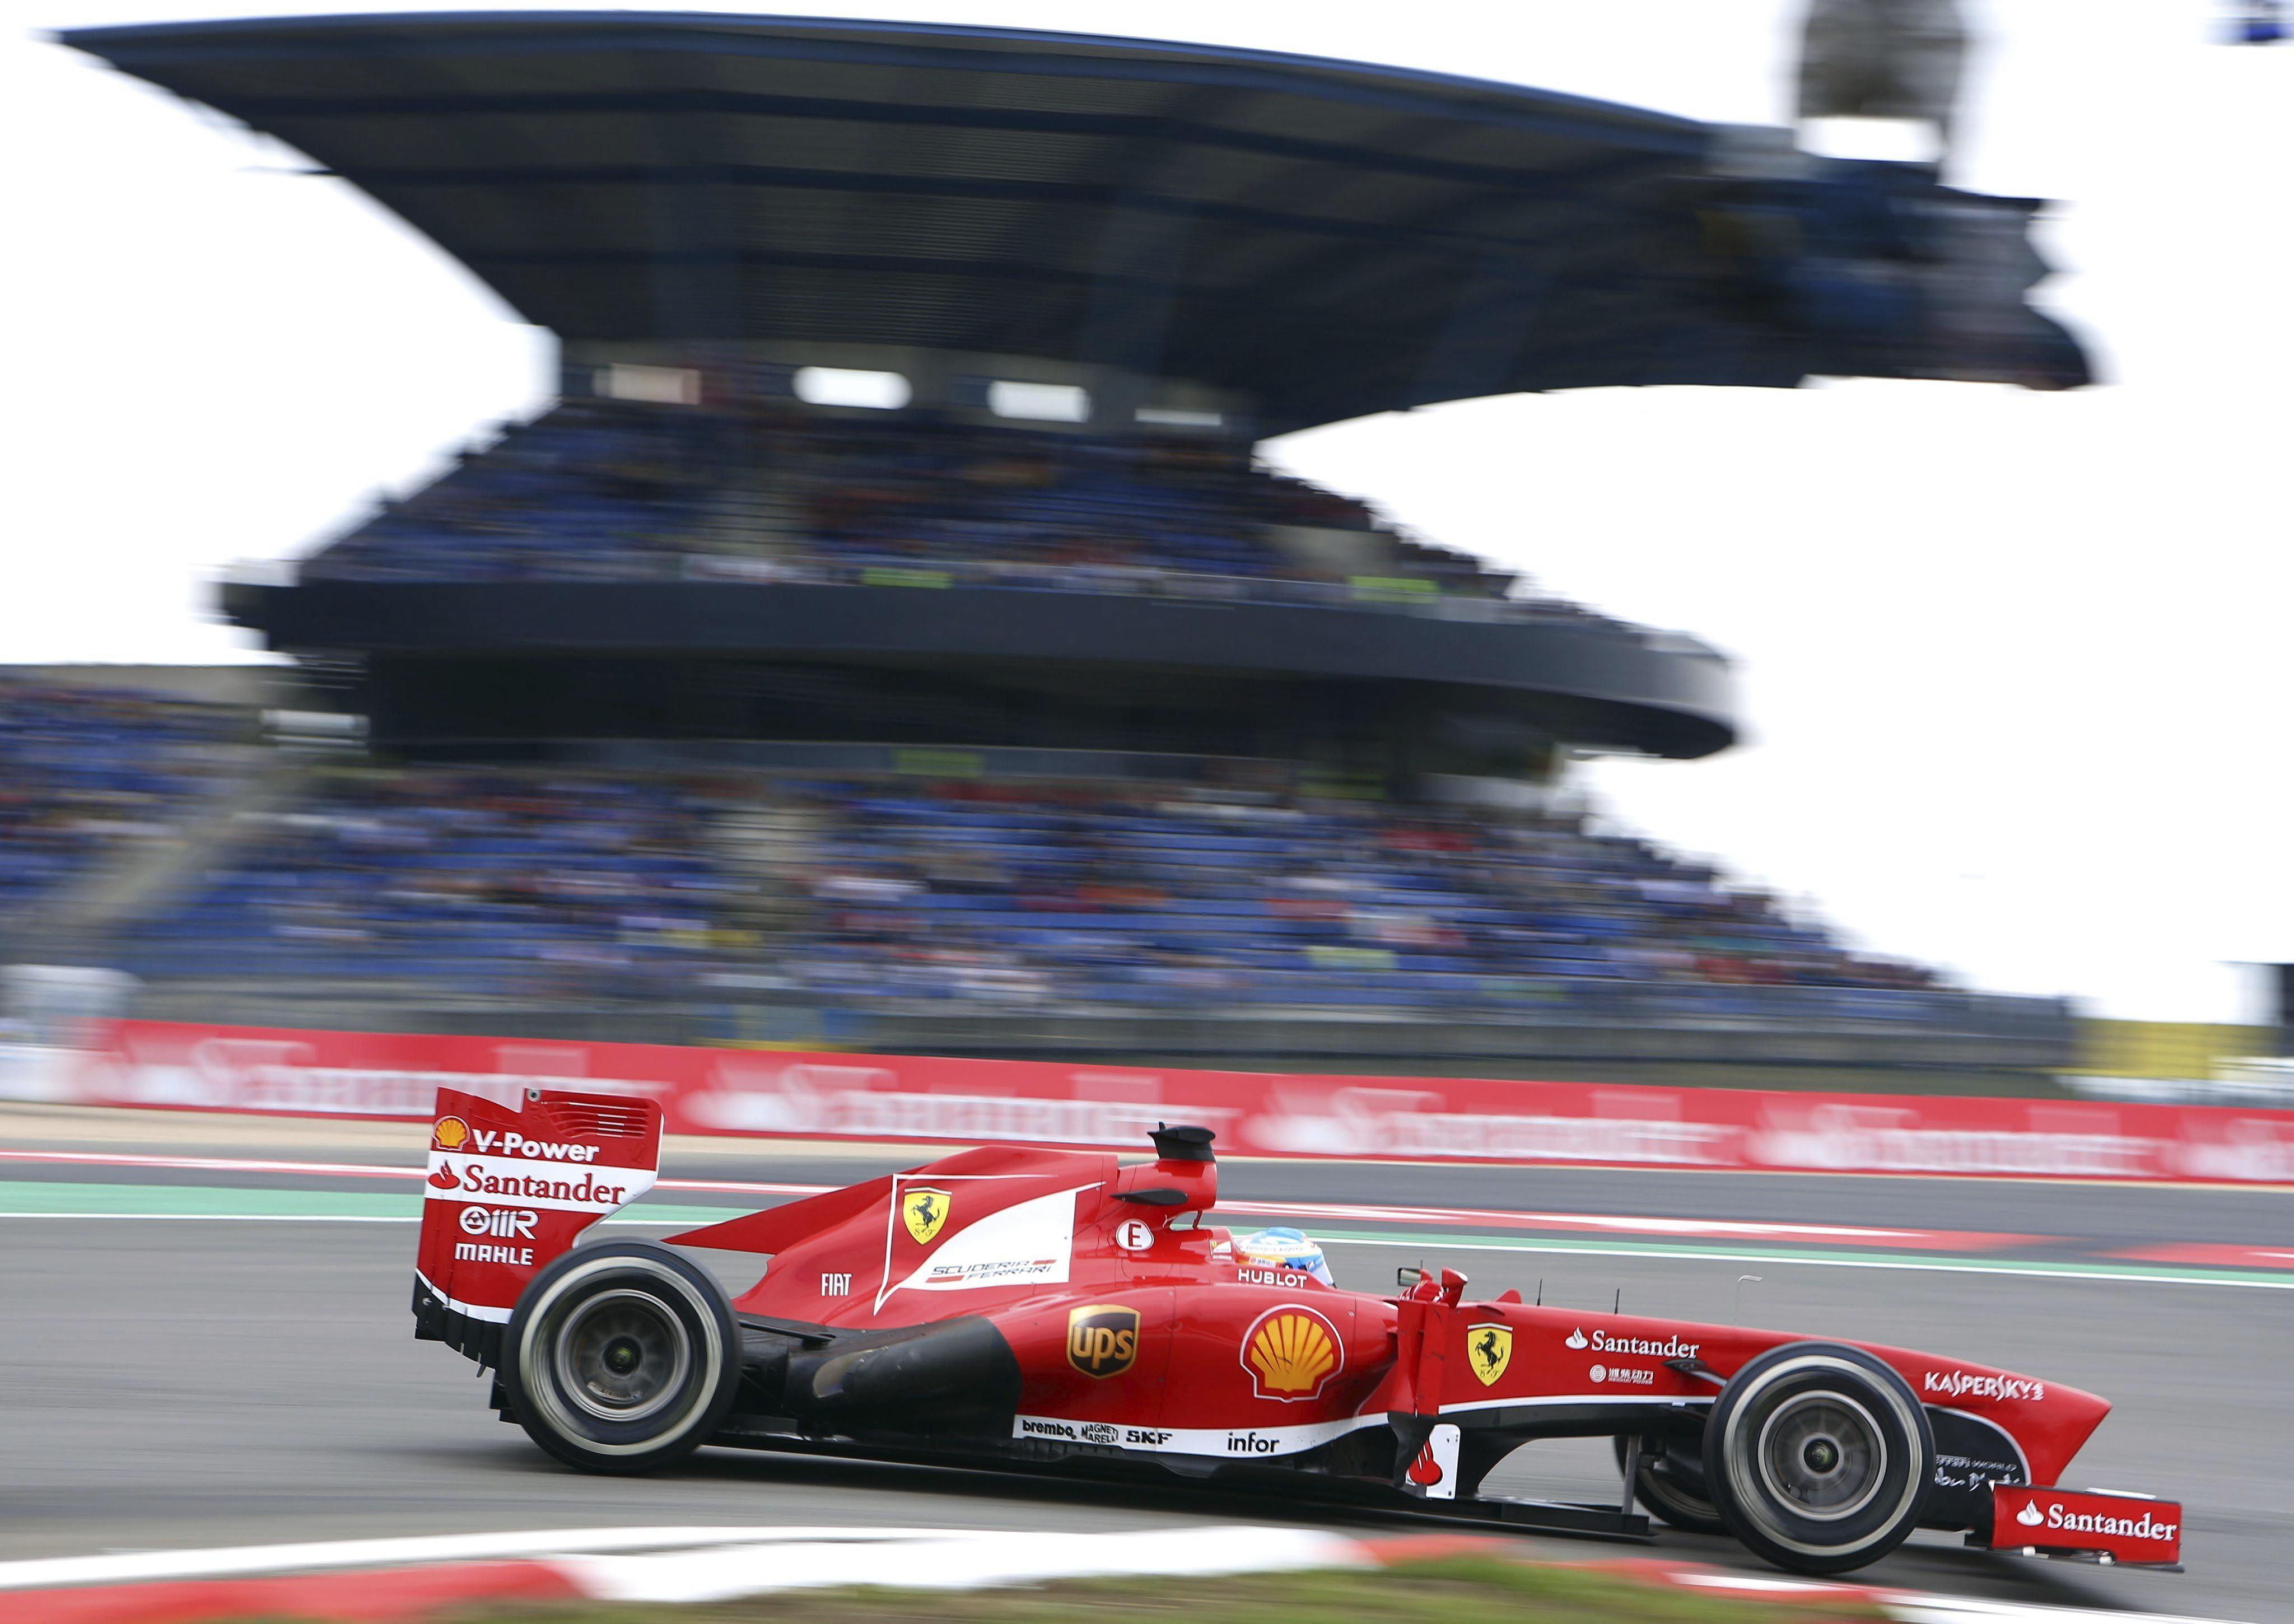 Alonso ve a Ferrari como «el tercer o el cuarto equipo de la parrilla»